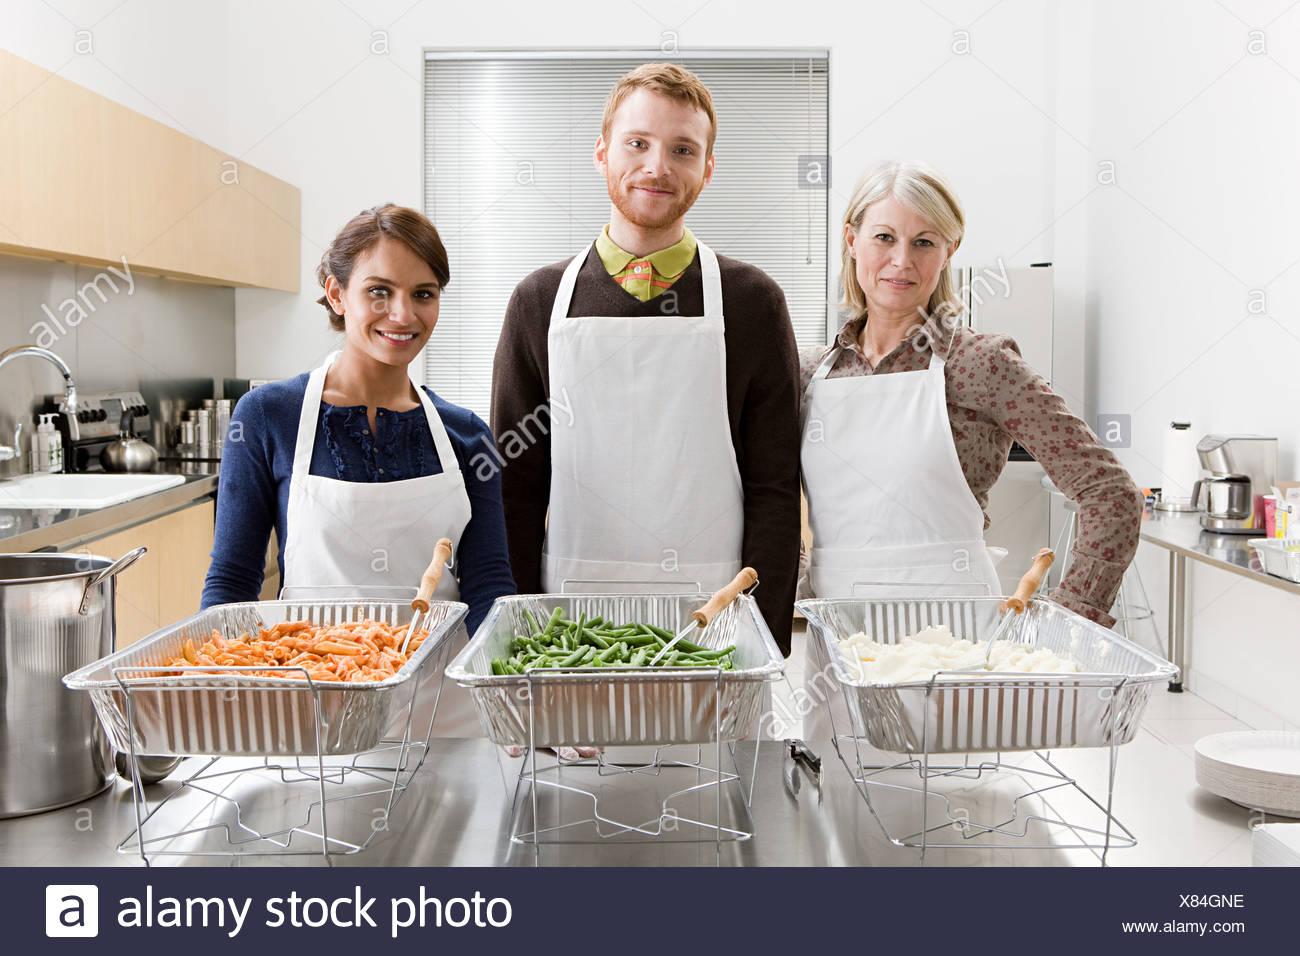 Soup Kitchen Stock Photos & Soup Kitchen Stock Images - Alamy